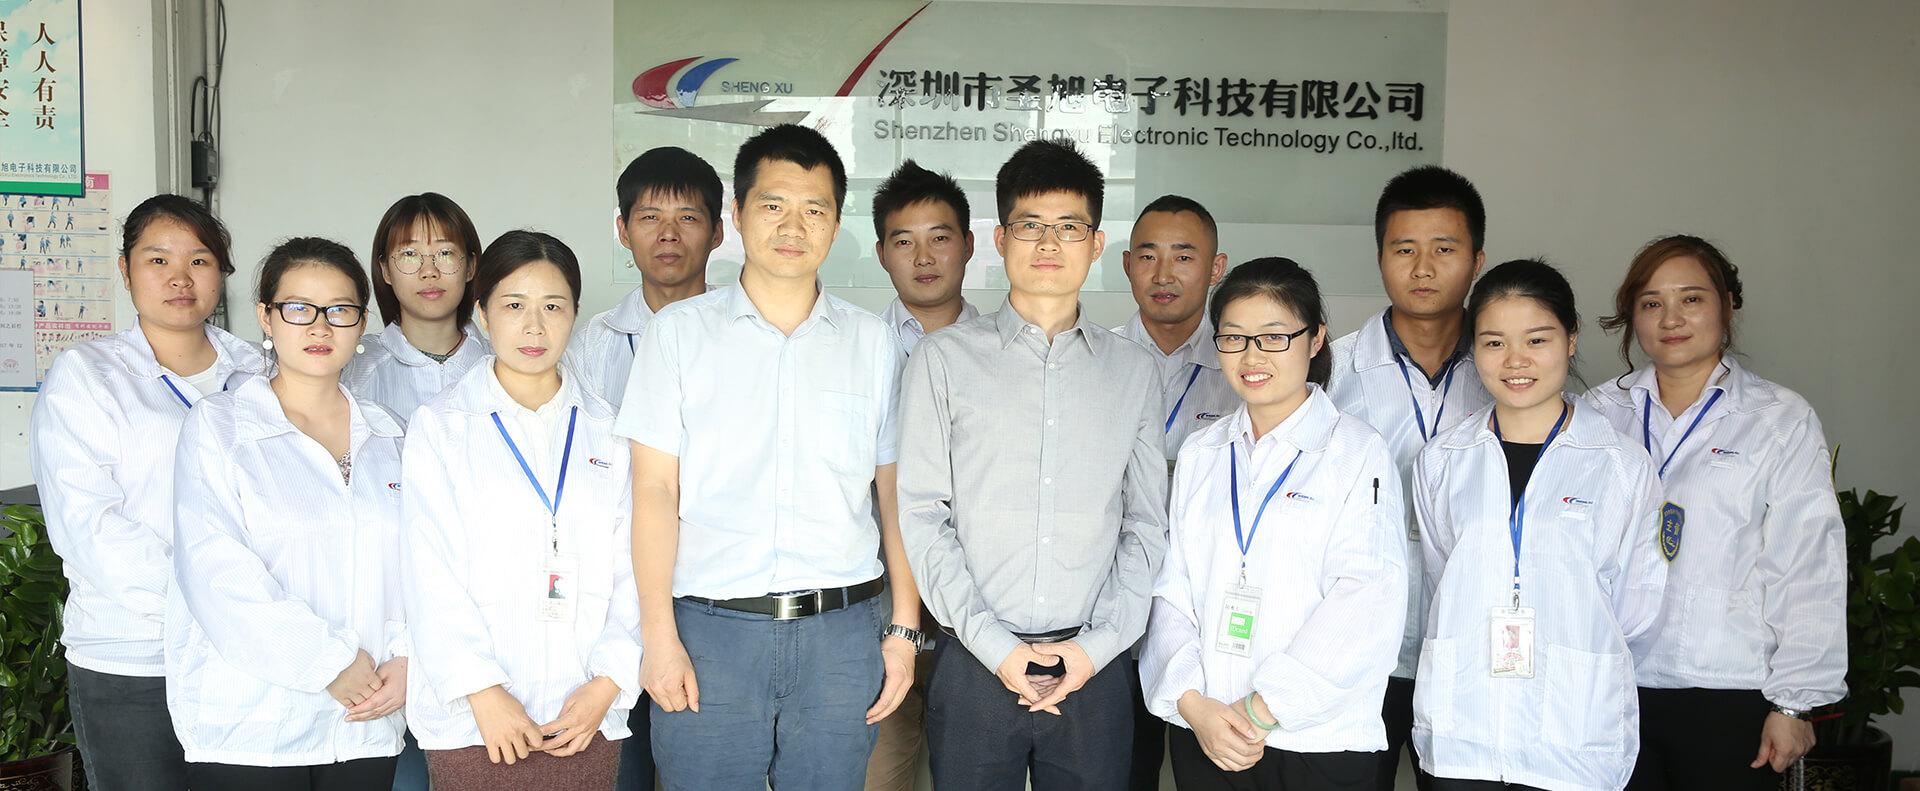 Shengxu Electronics Technology